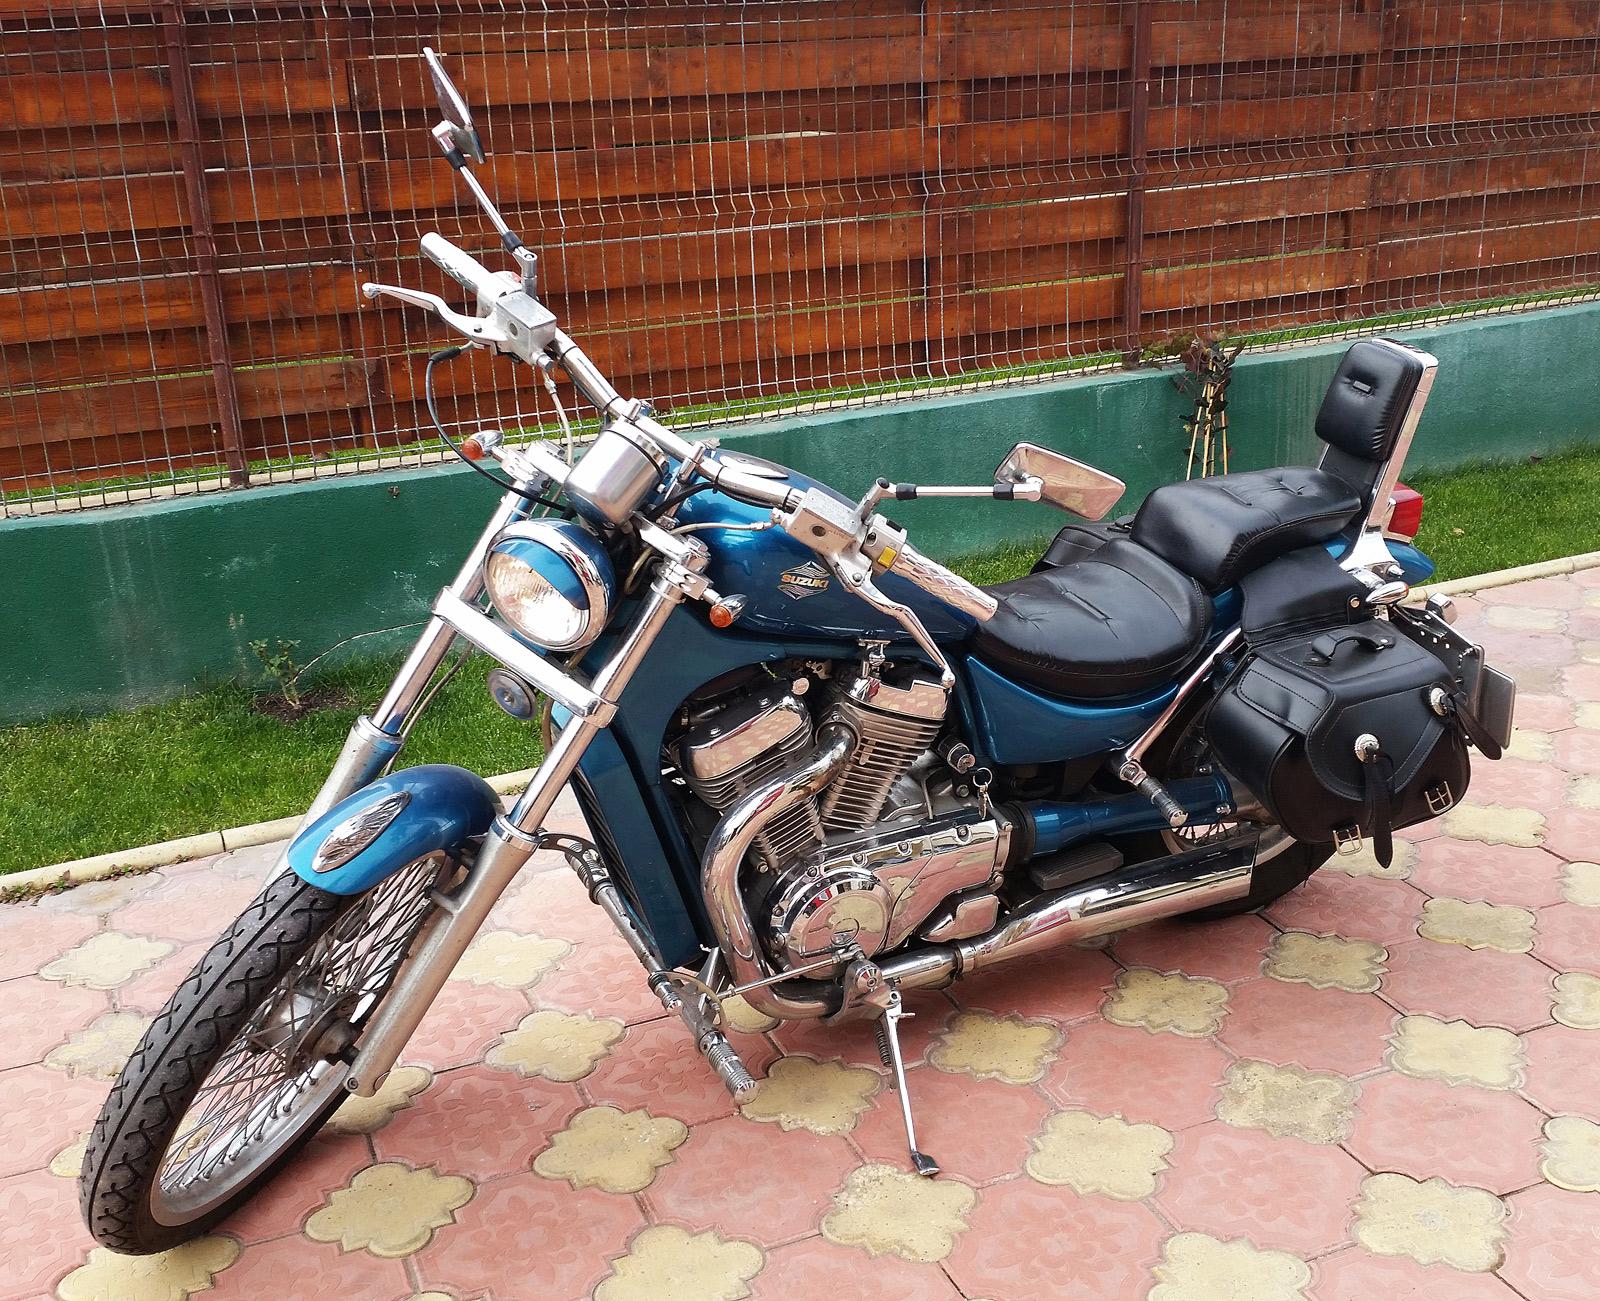 Suzuki-Intruder-600-cc---03